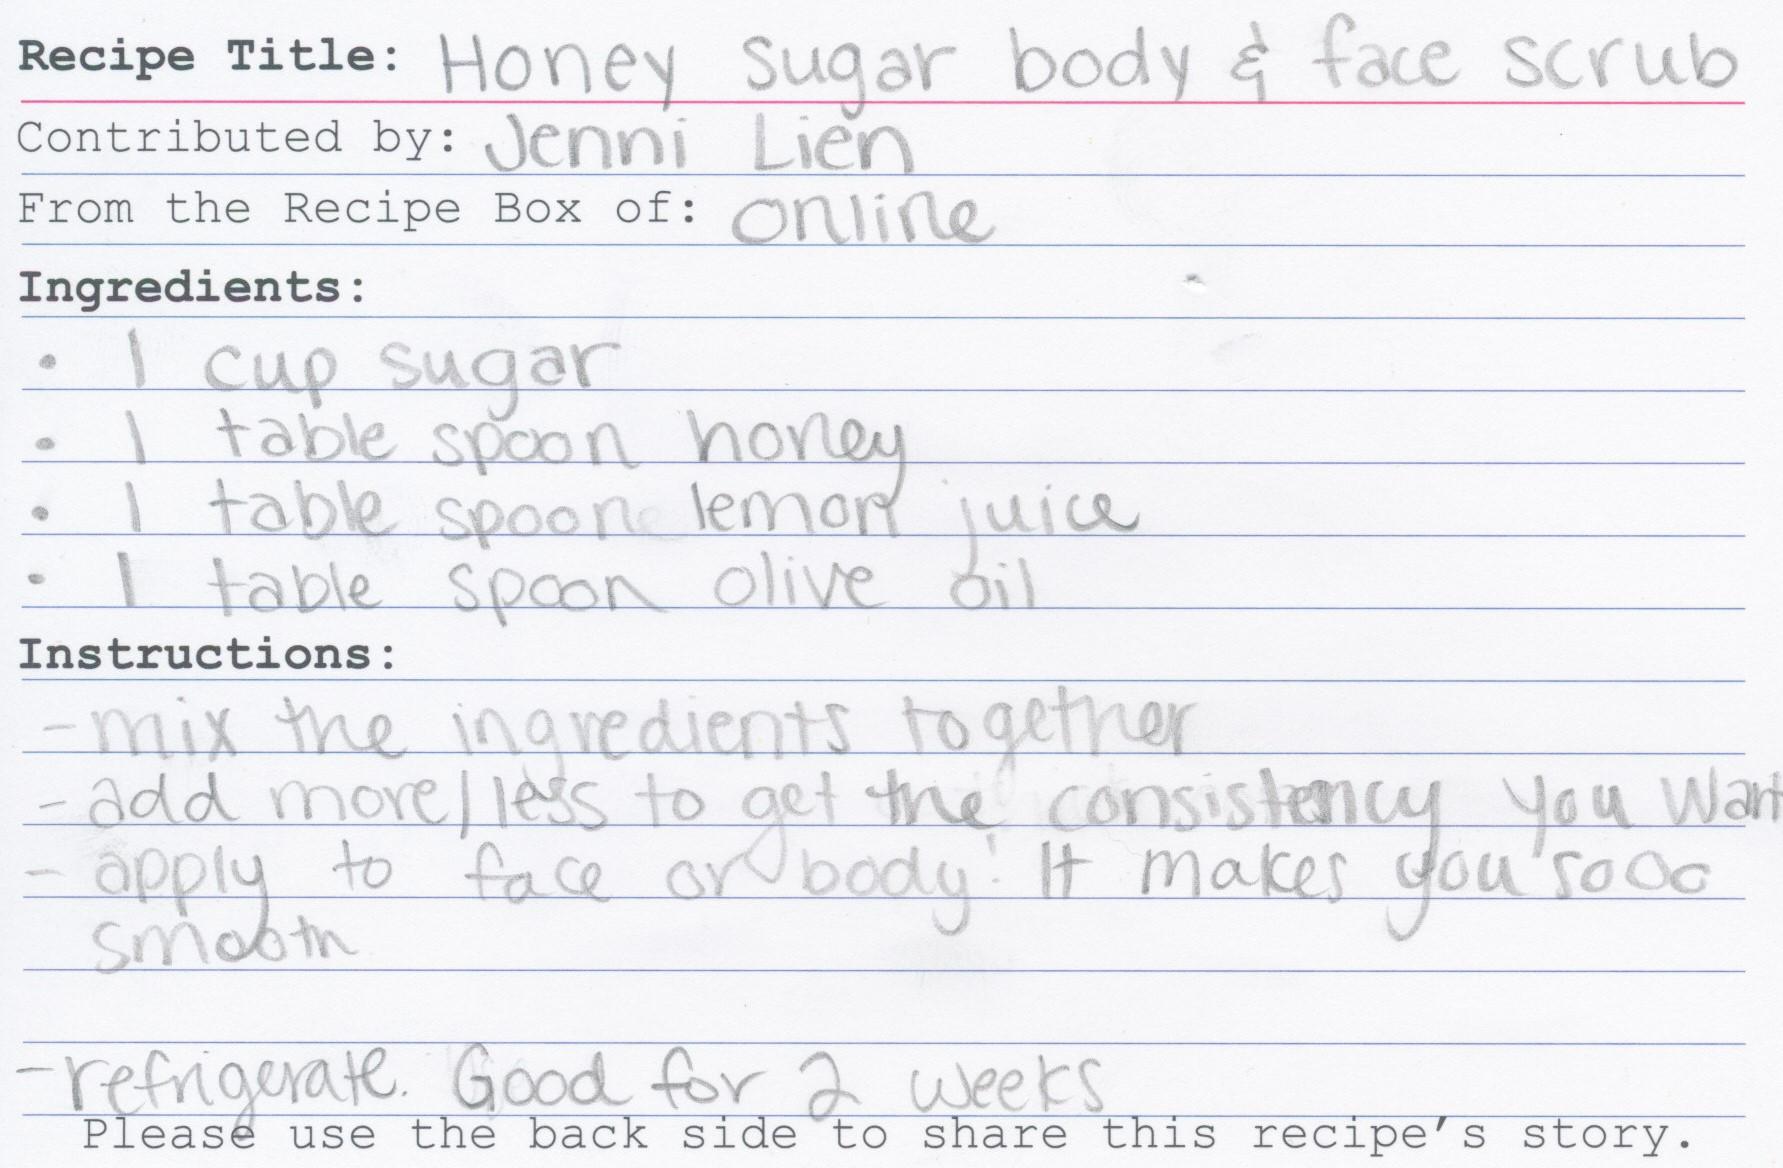 Honey Sugar Body and Face Scrub